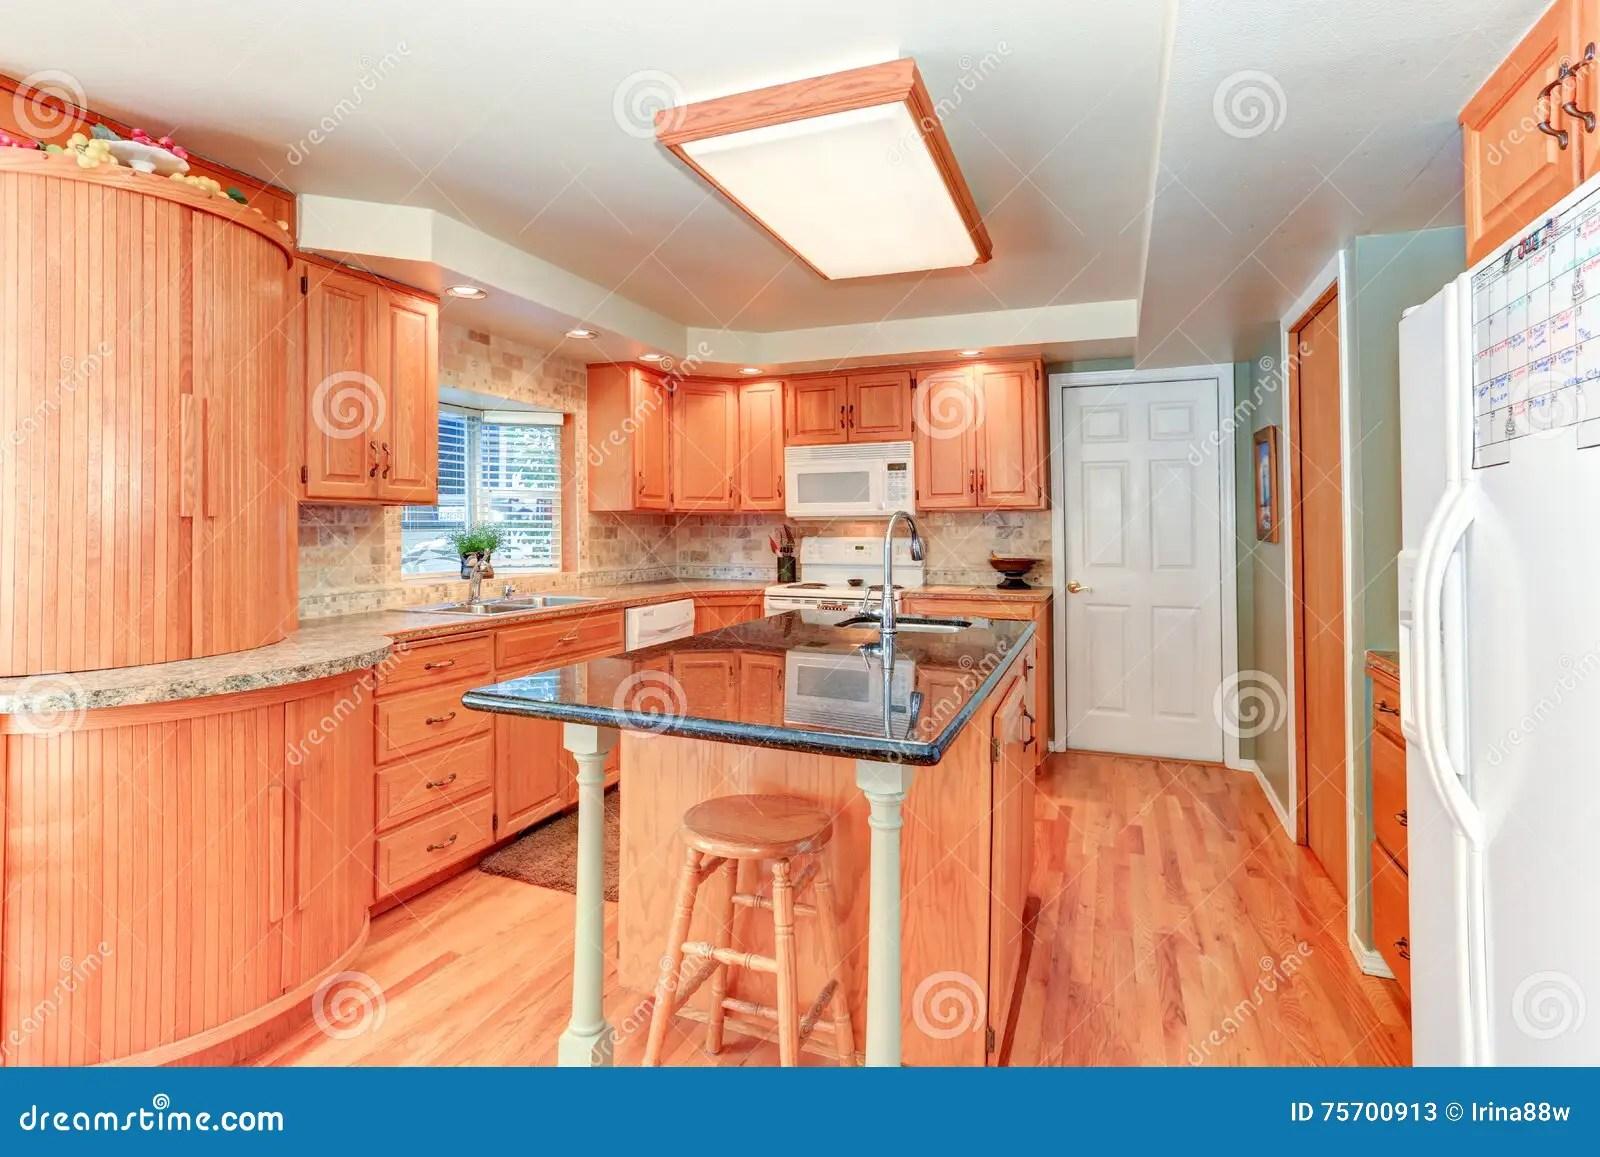 kitchen updates outdoor kitchens ideas 与橡木细木家具的明亮的厨房内部库存图片 图片包括有家具 西北 干净 与橡木细木家具的明亮的厨房内部